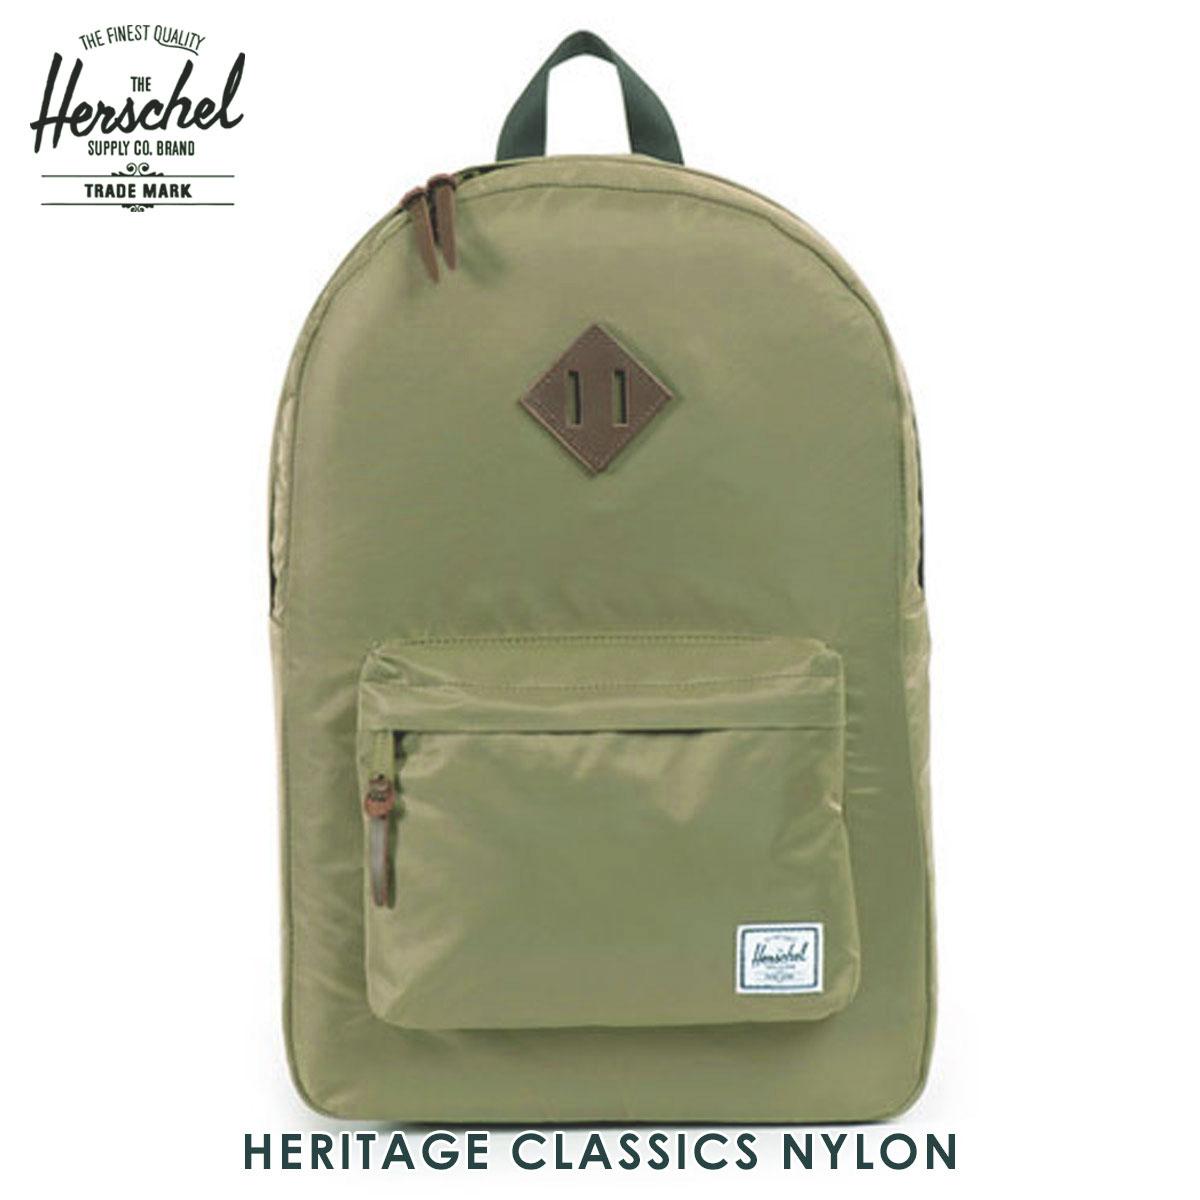 30%OFFセール 【販売期間 6/4 20:00~6/11 01:59】 ハーシェル バッグ 正規販売店 Herschel Supply ハーシャルサプライ バッグ Heritage Classics - Nylon 10007-00589-OS Fern D15S25 父の日